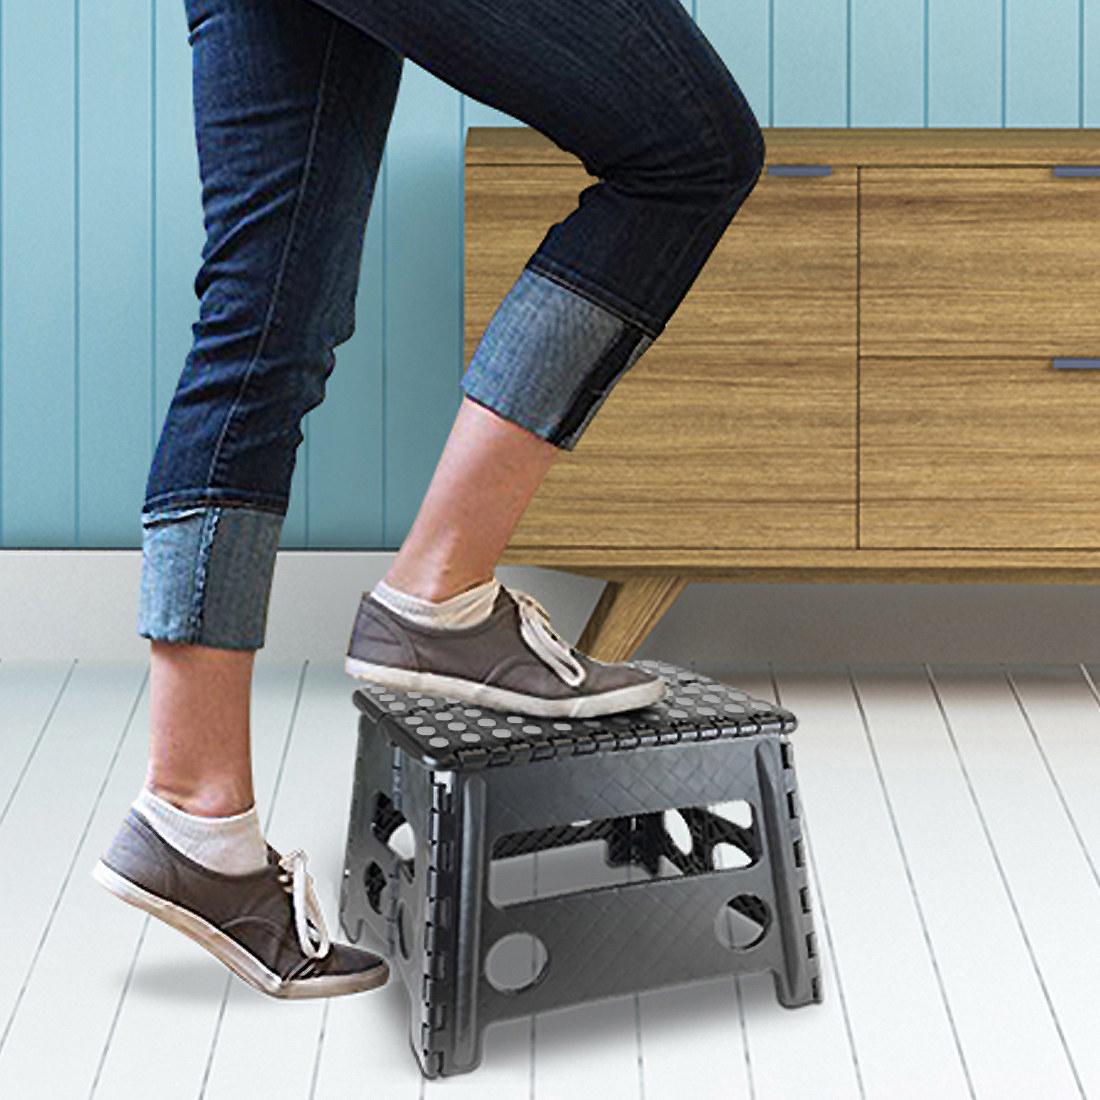 Model using black plastic step stool